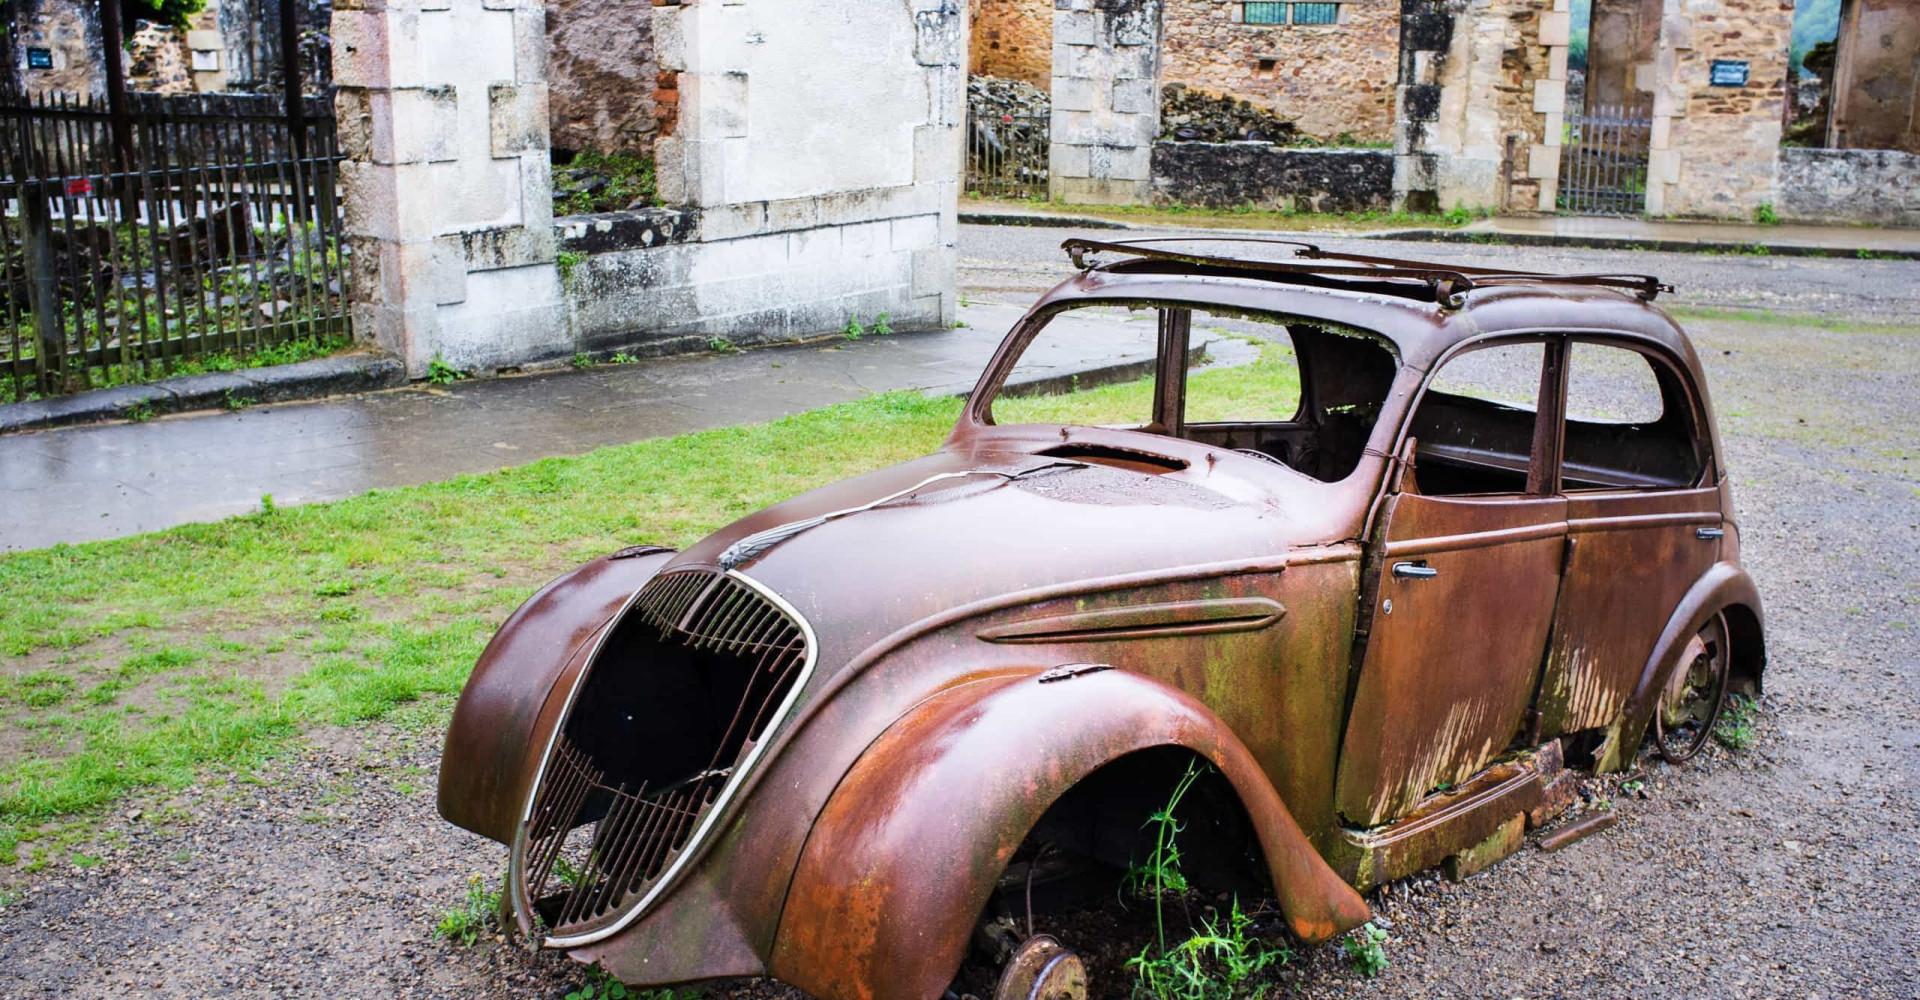 Muistelemme Oradour-sur-Glanen verilöylyä